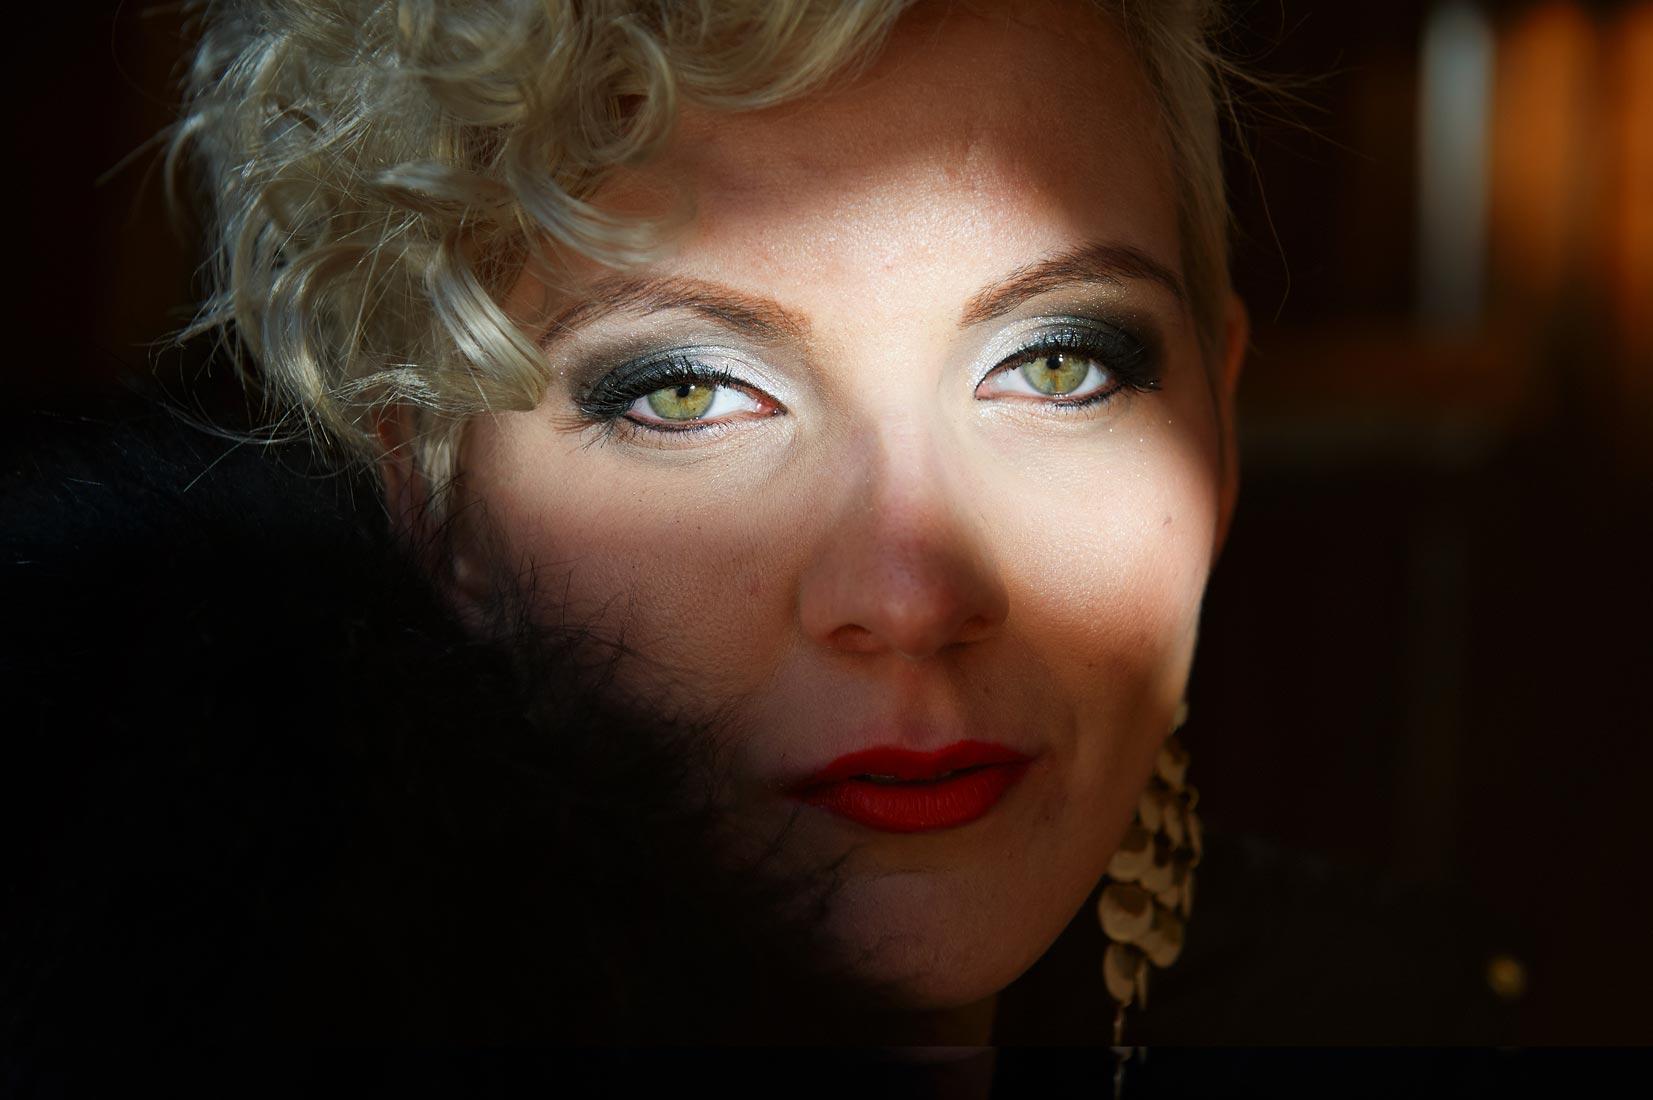 Portraitfotos – Beautyshot Anita im Streiflicht